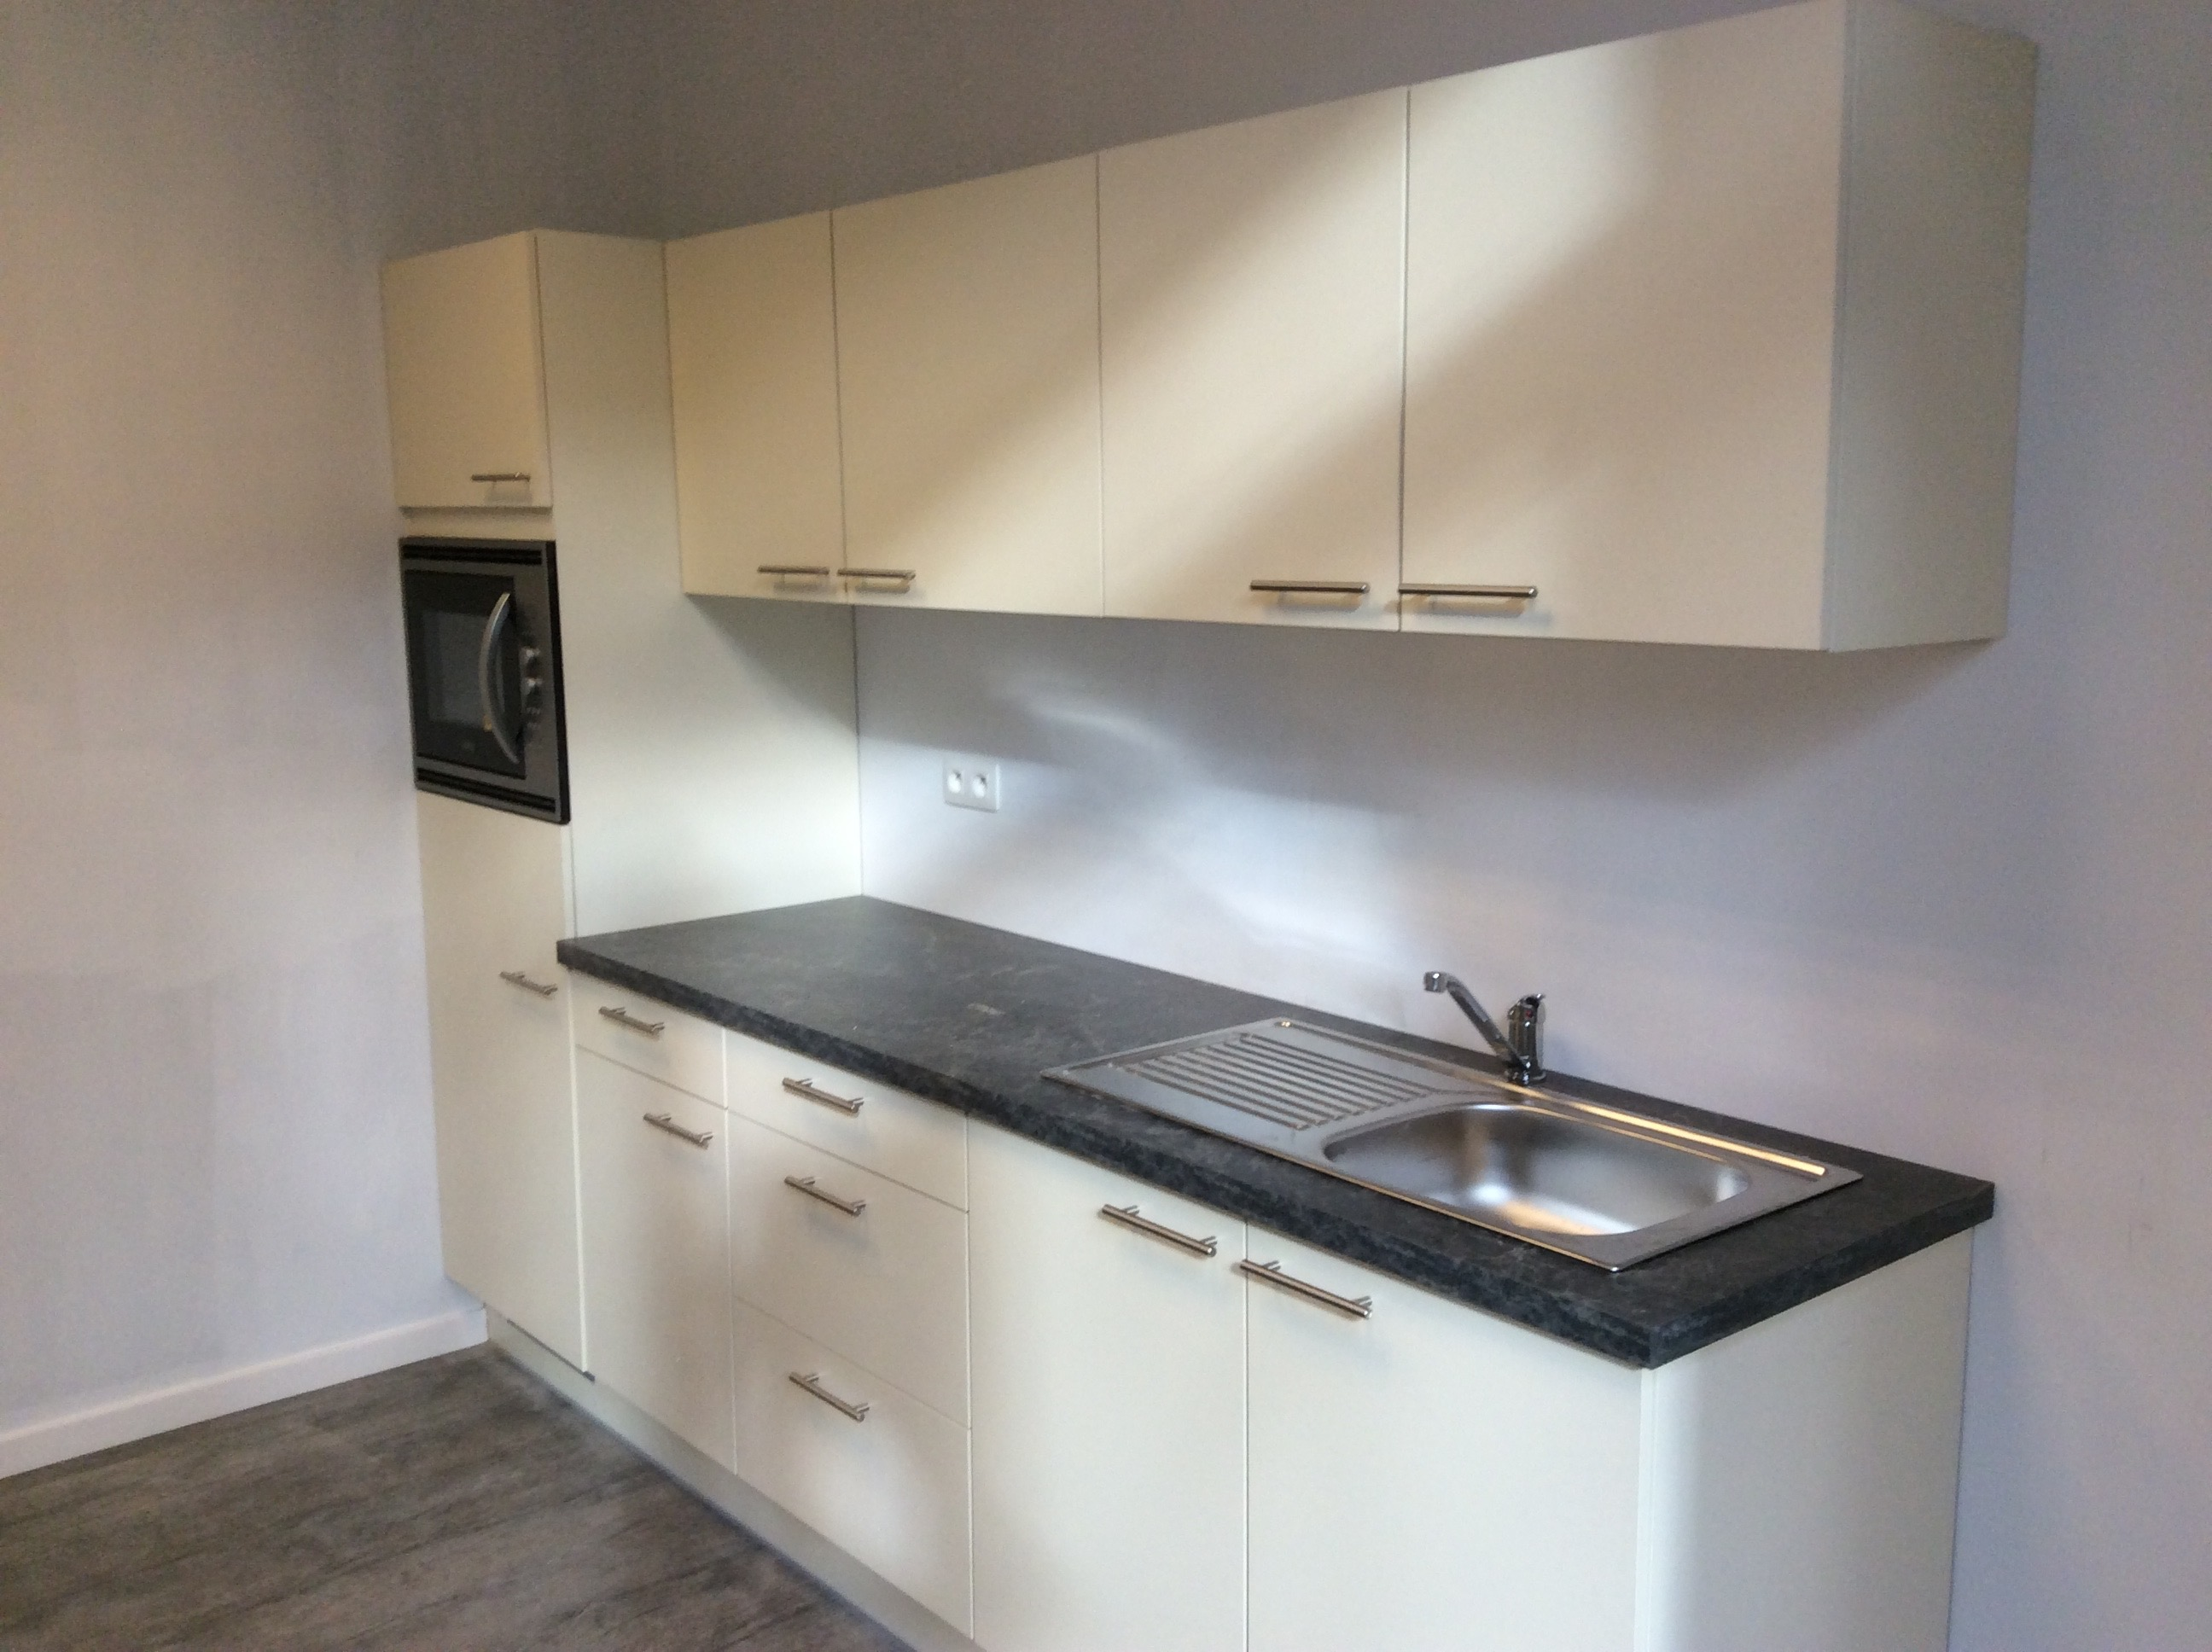 Plaatsen van keukenblok